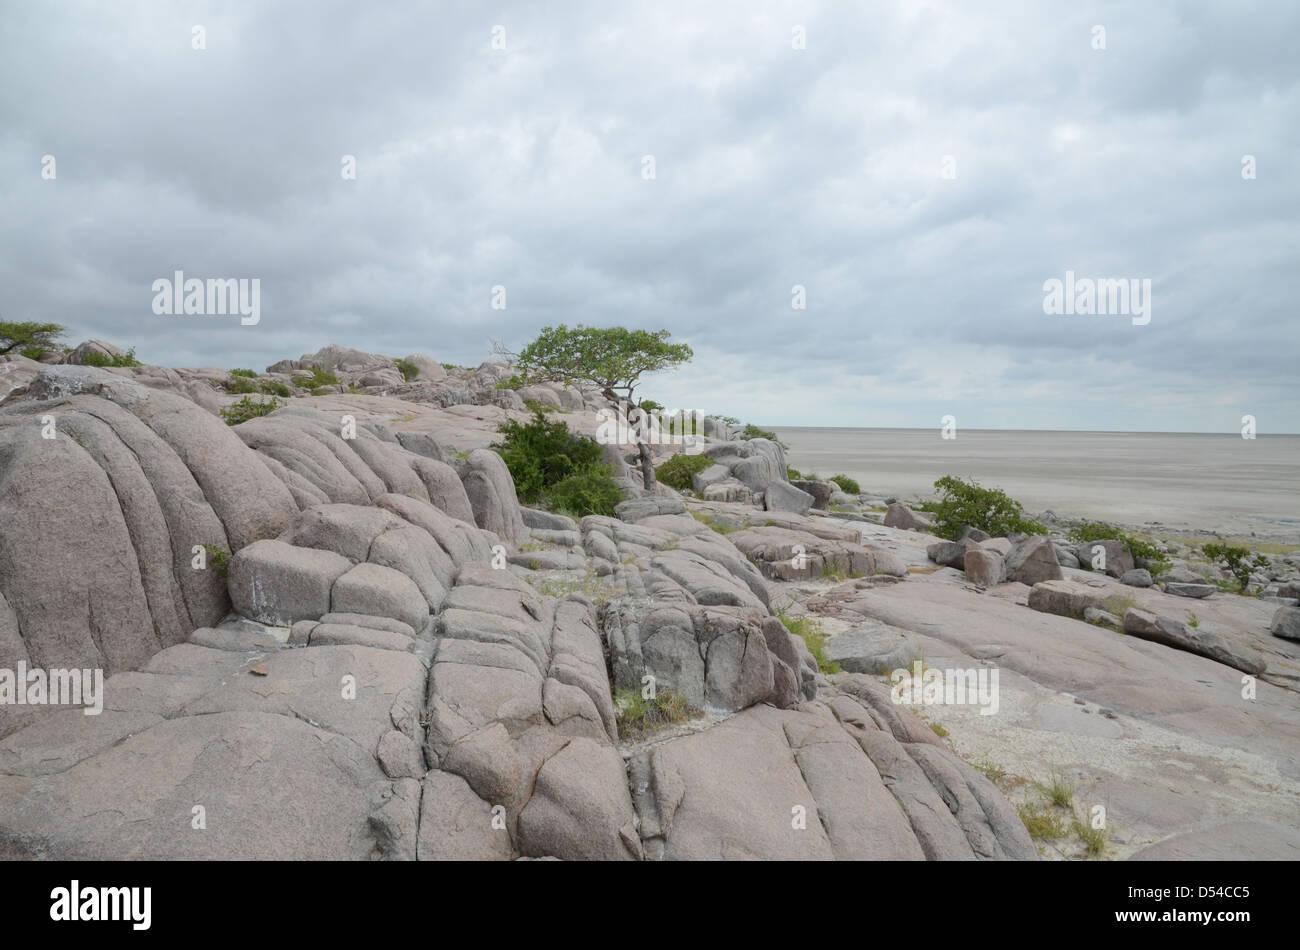 View of Kubu island and the Sua Pan, Botswana - Stock Image